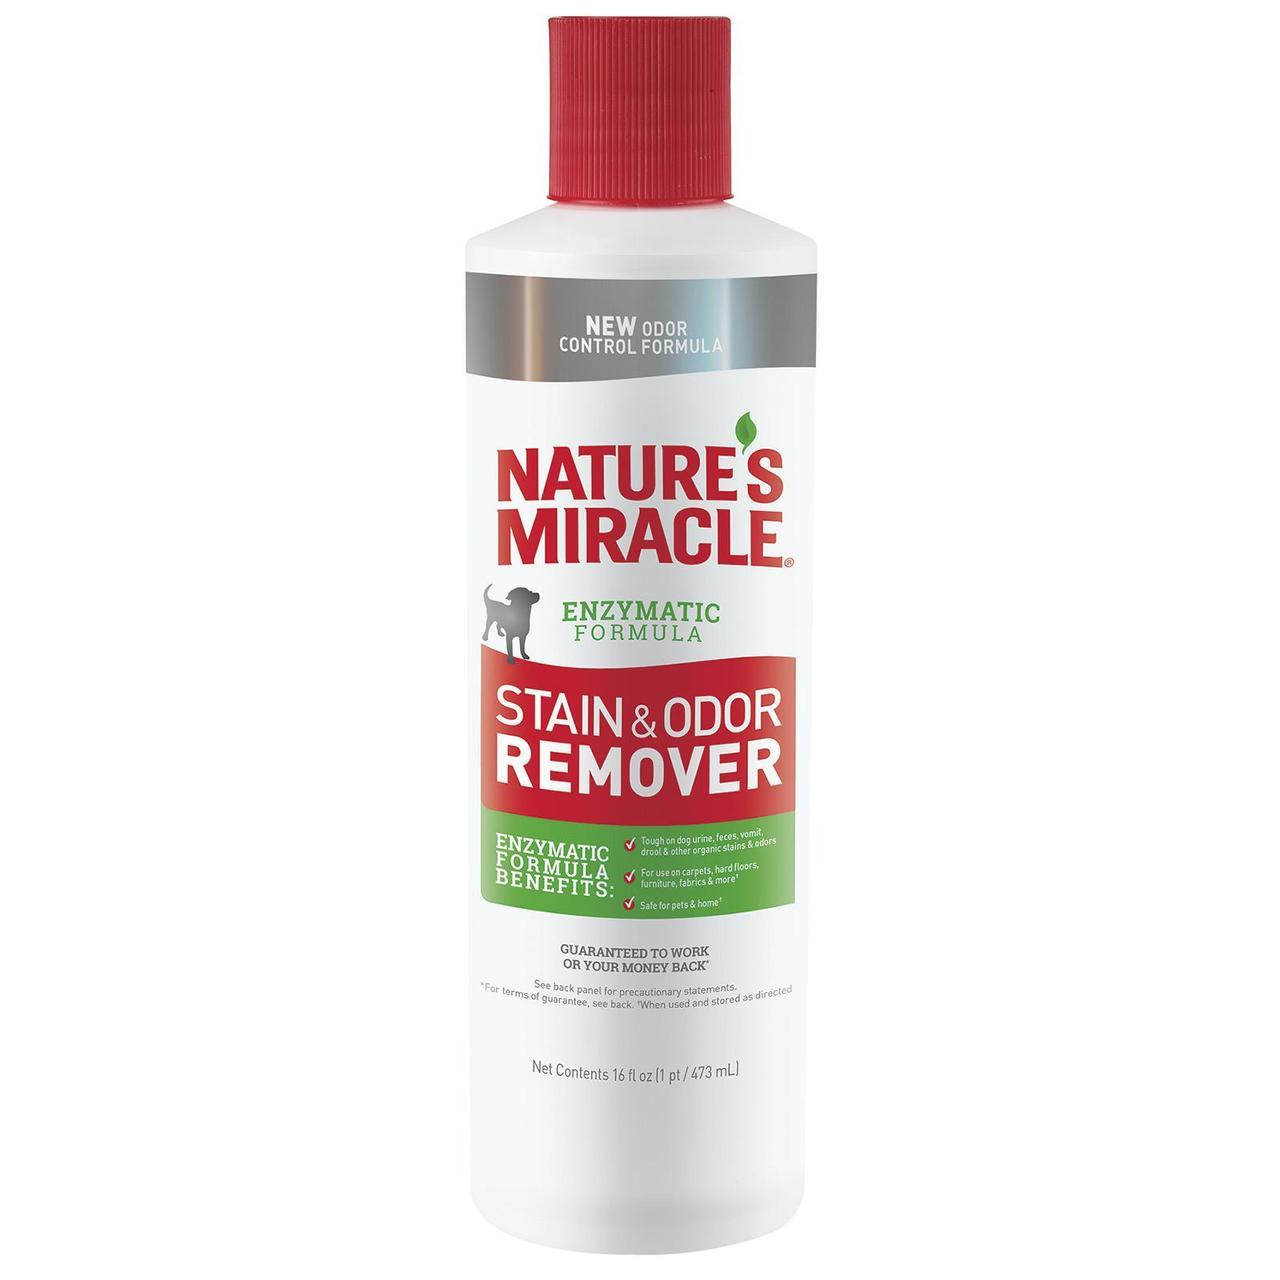 Natures Miracle Dog Stain & Odor Remover 473 мл уничтожитель пятен и запахов от собак